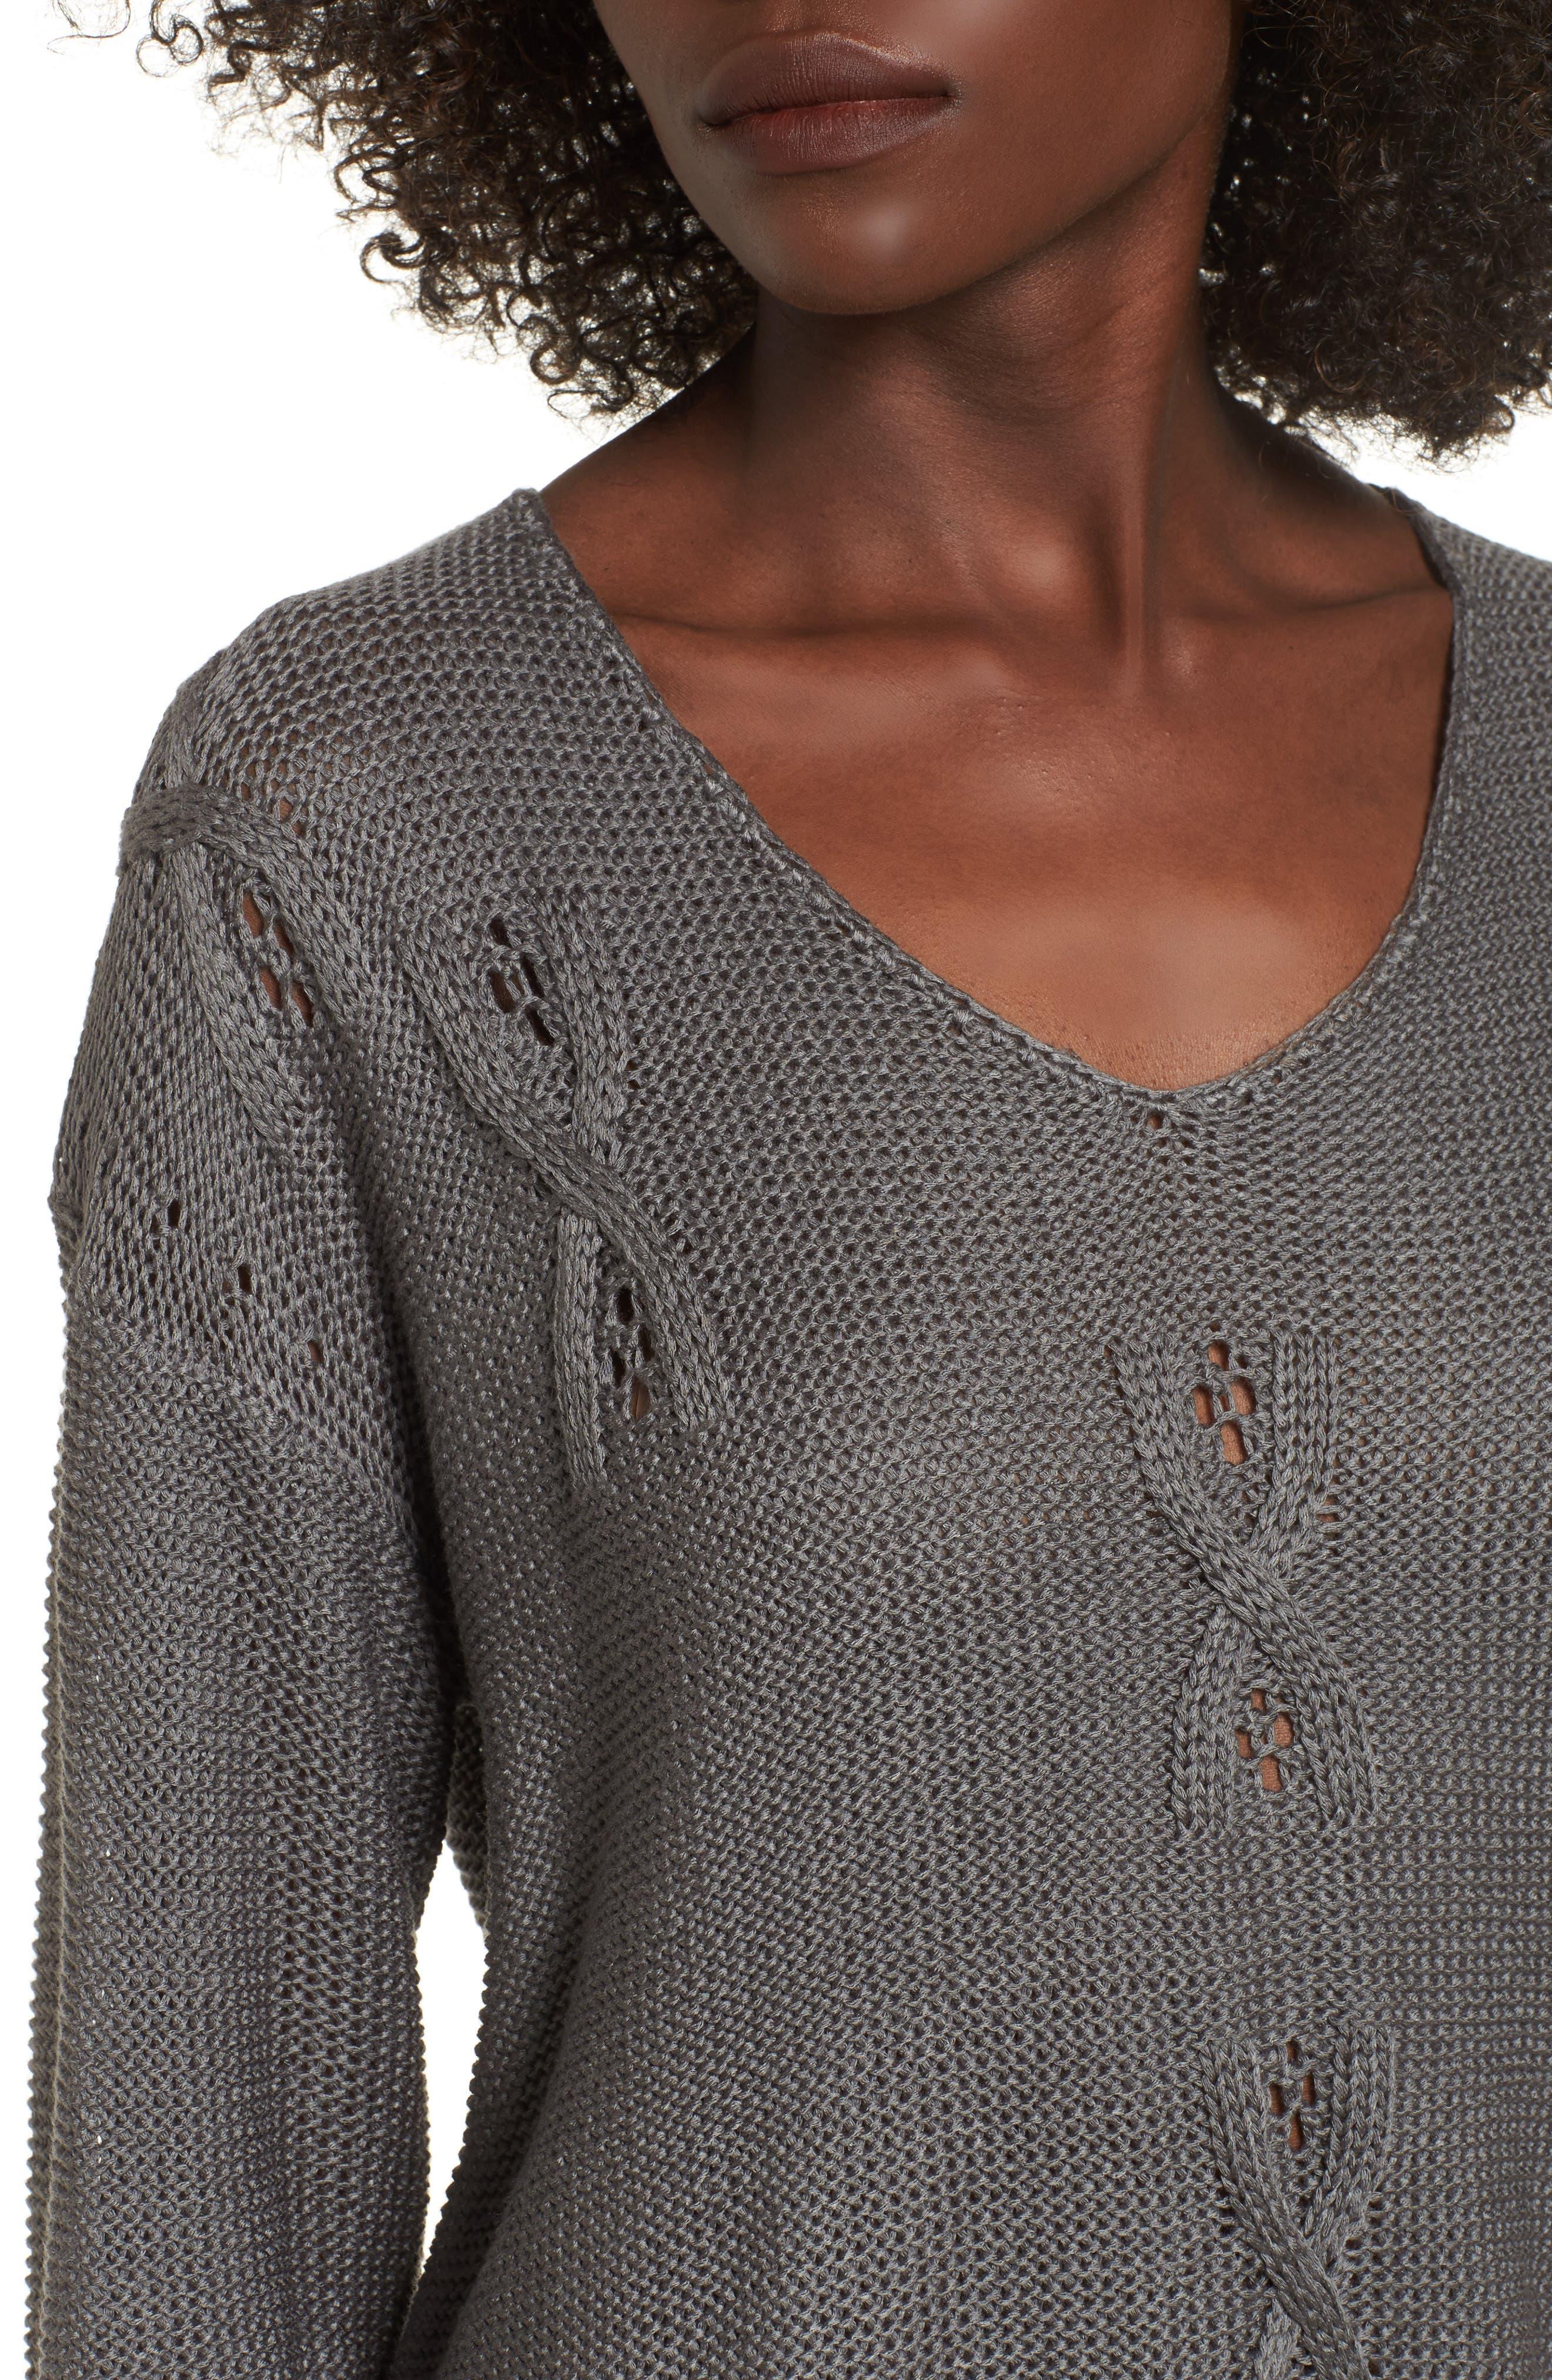 Patti Longline Sweater,                             Alternate thumbnail 4, color,                             021